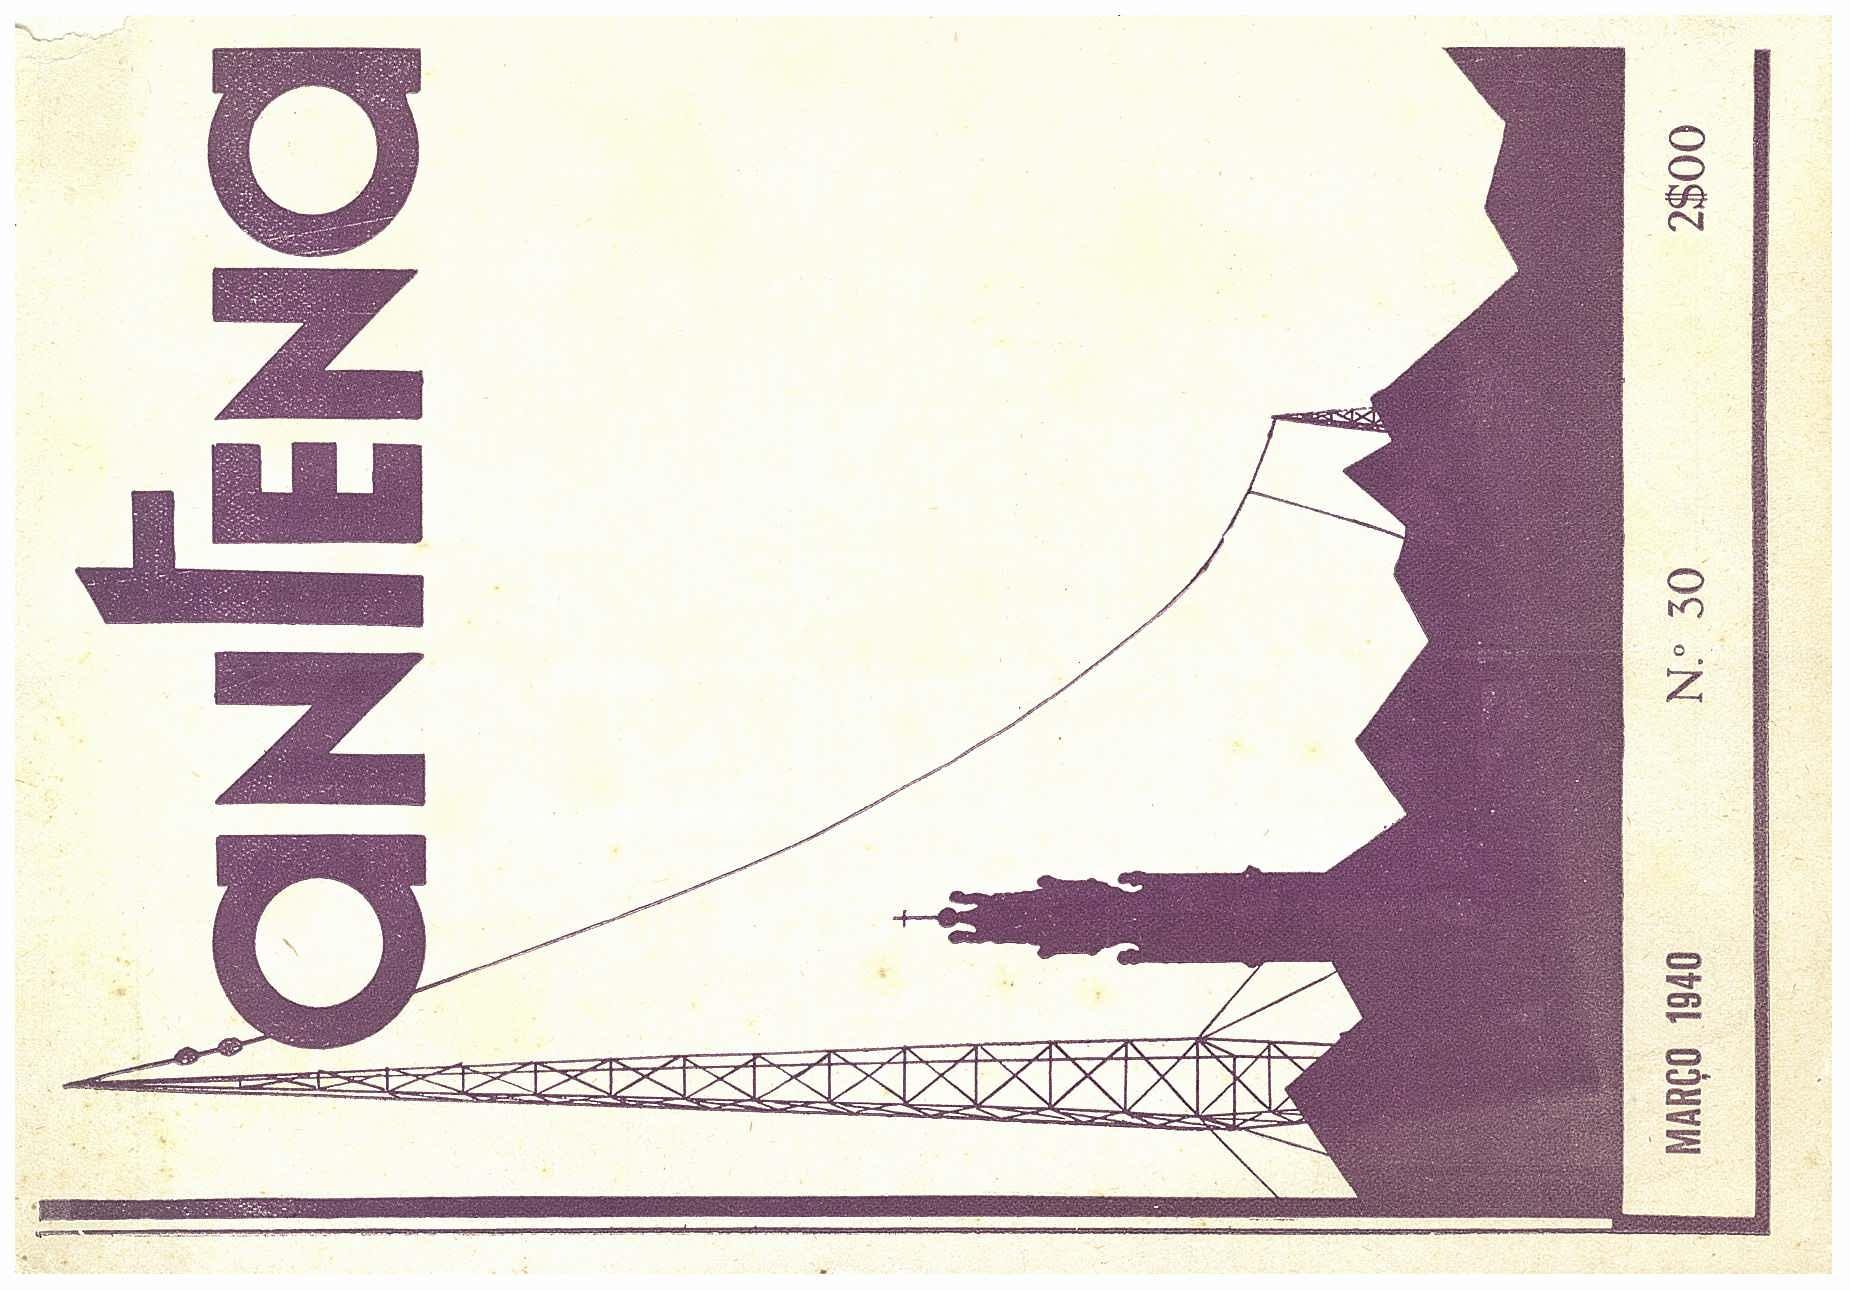 Capa da revista Antena, nº30